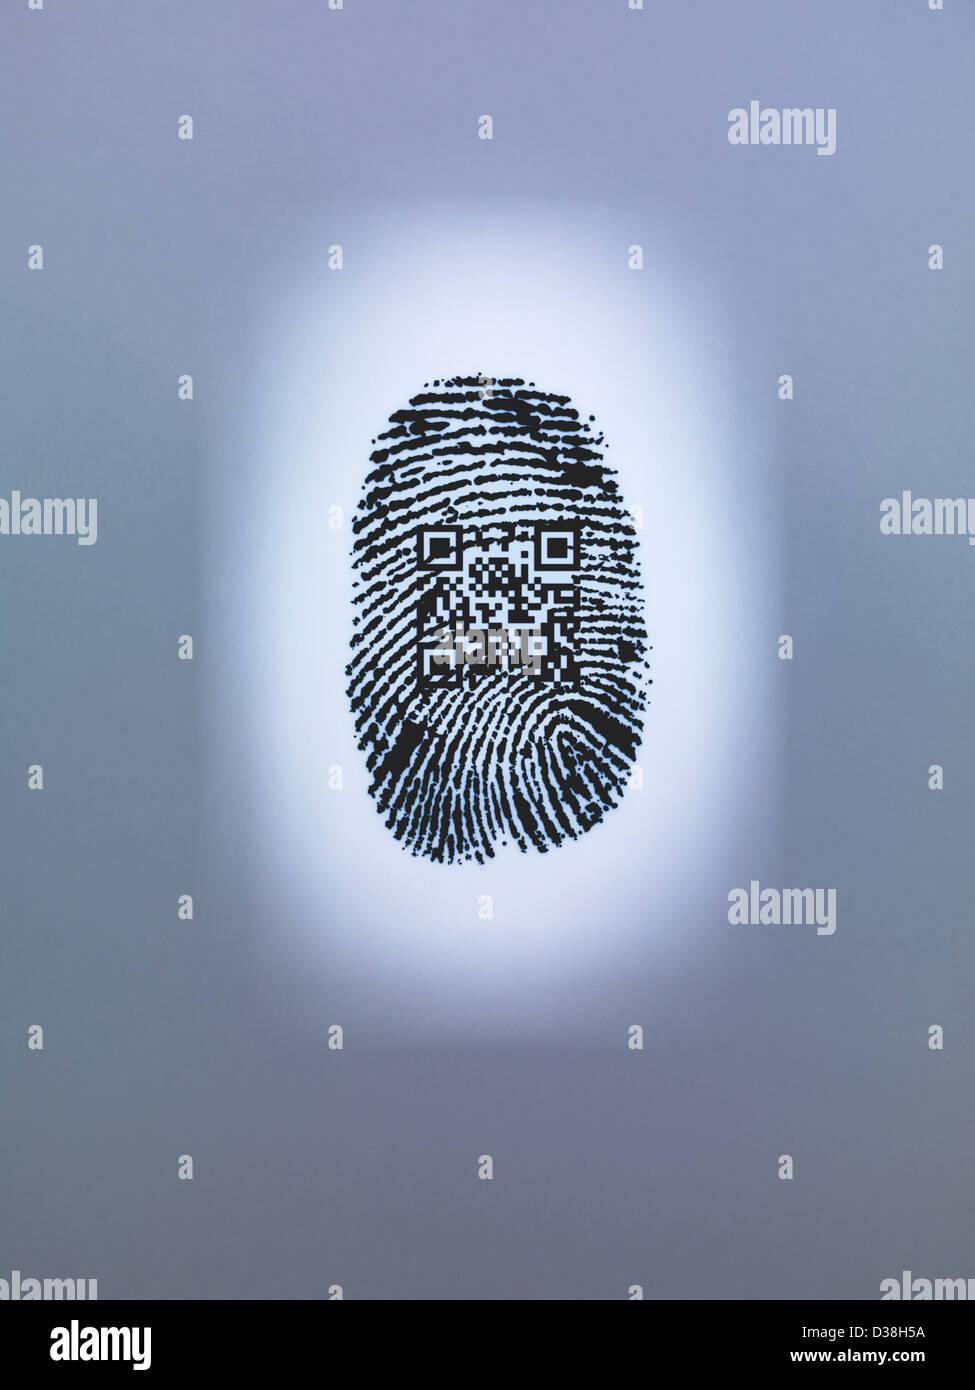 QR code in finger print - Stock Image